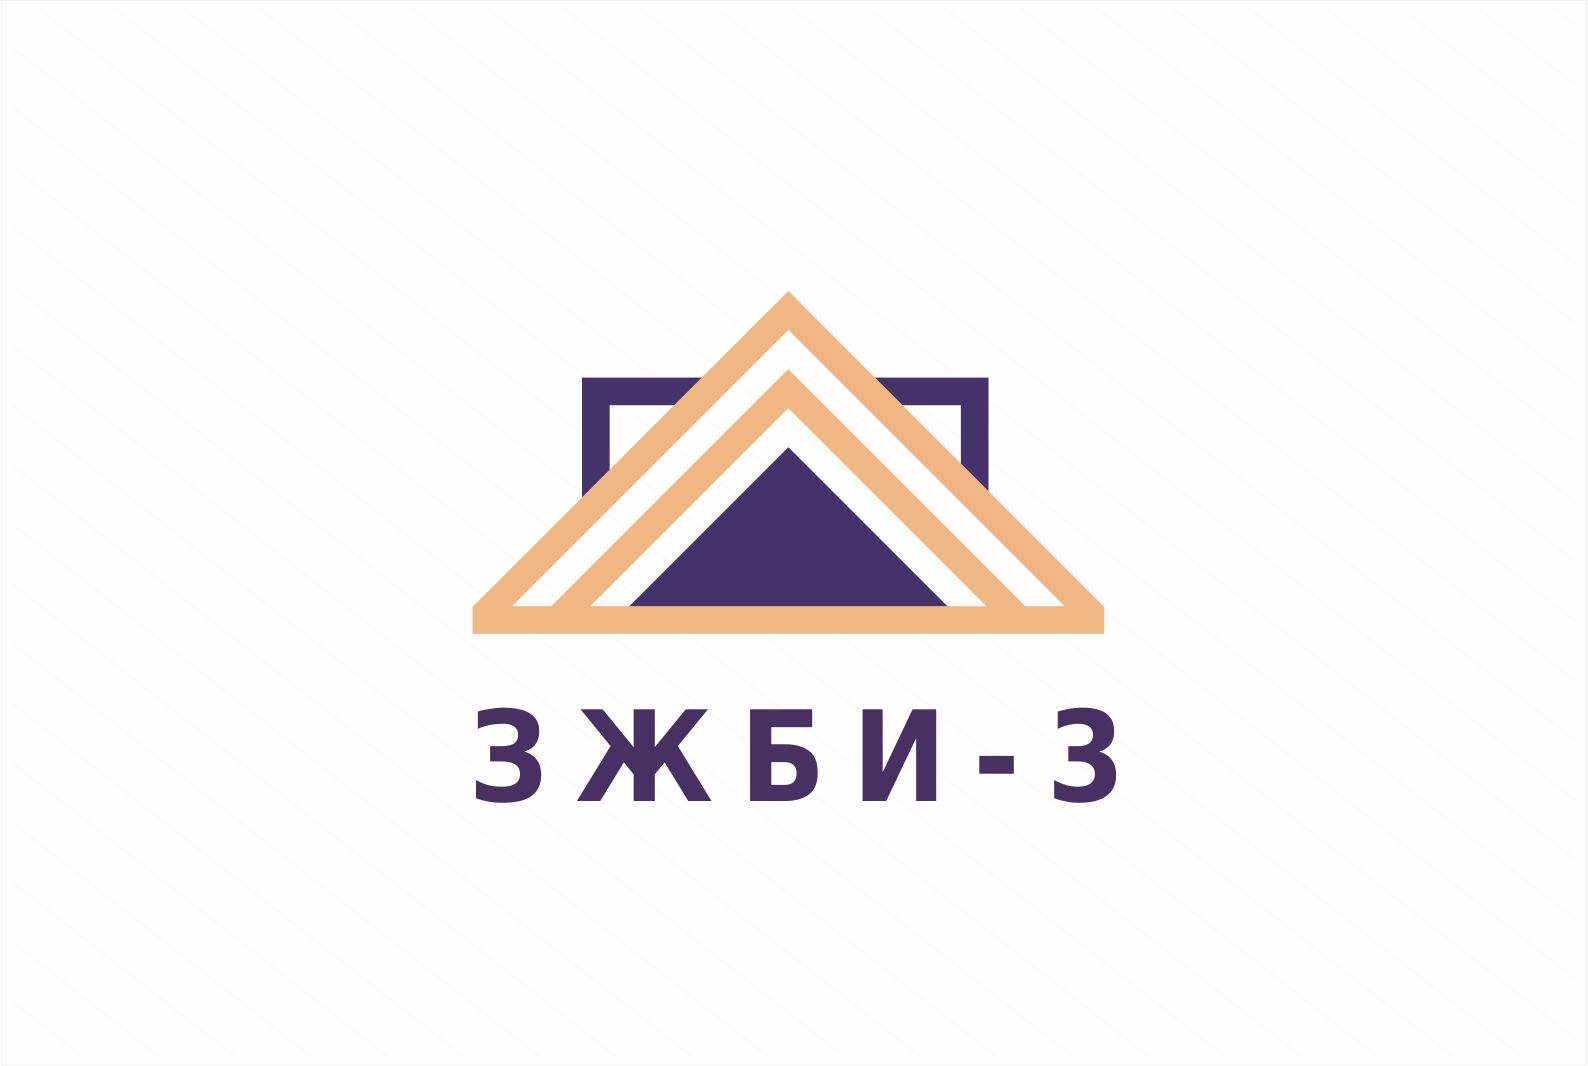 Разработка логотипа и фирменный стиль фото f_177597080115ad90.jpg